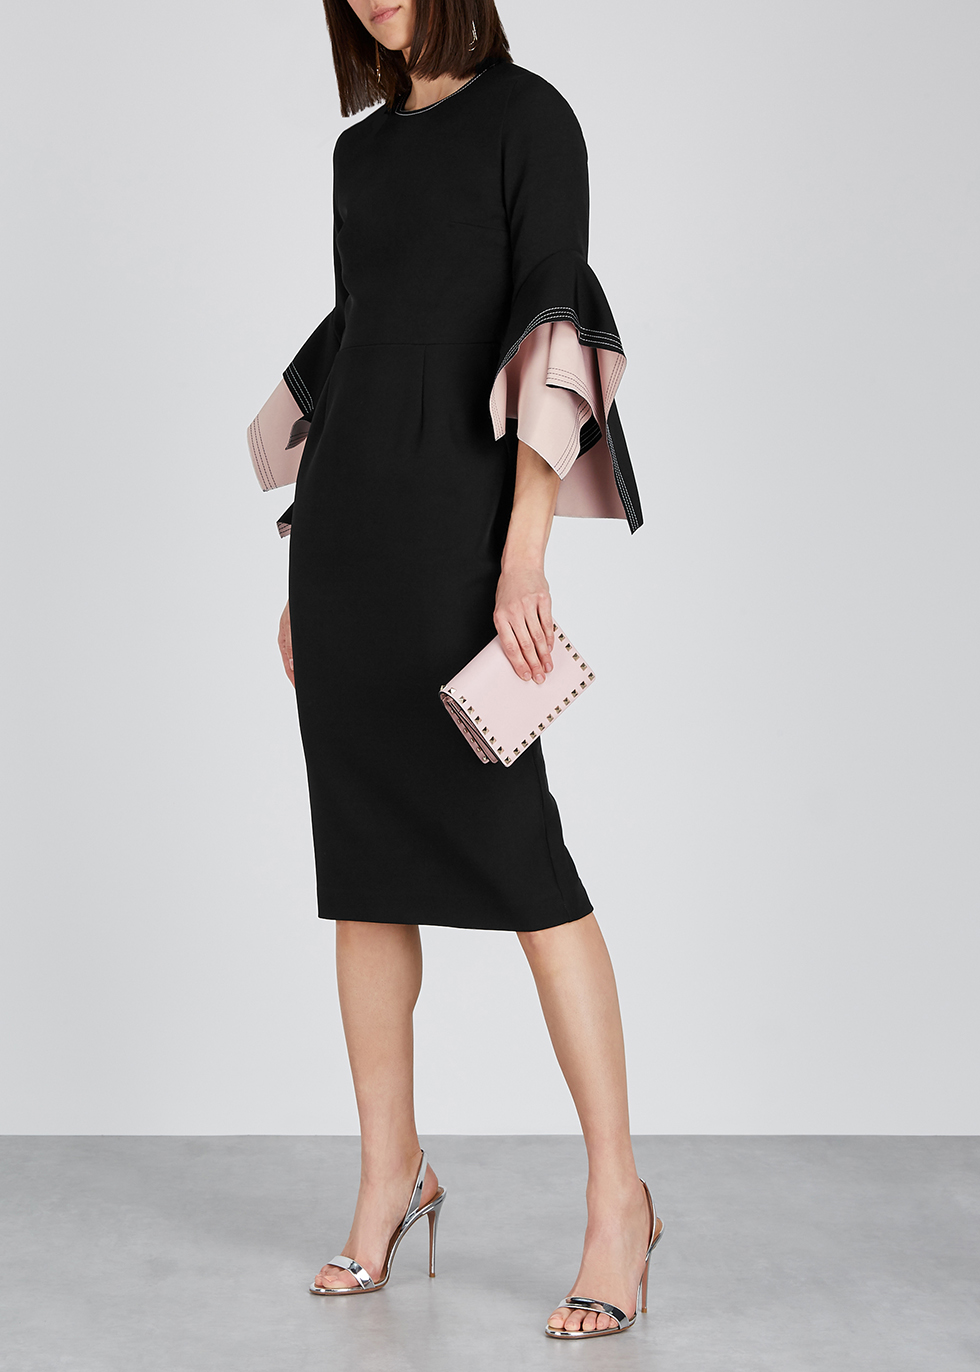 Ronda black origami-sleeve dress - Roksanda